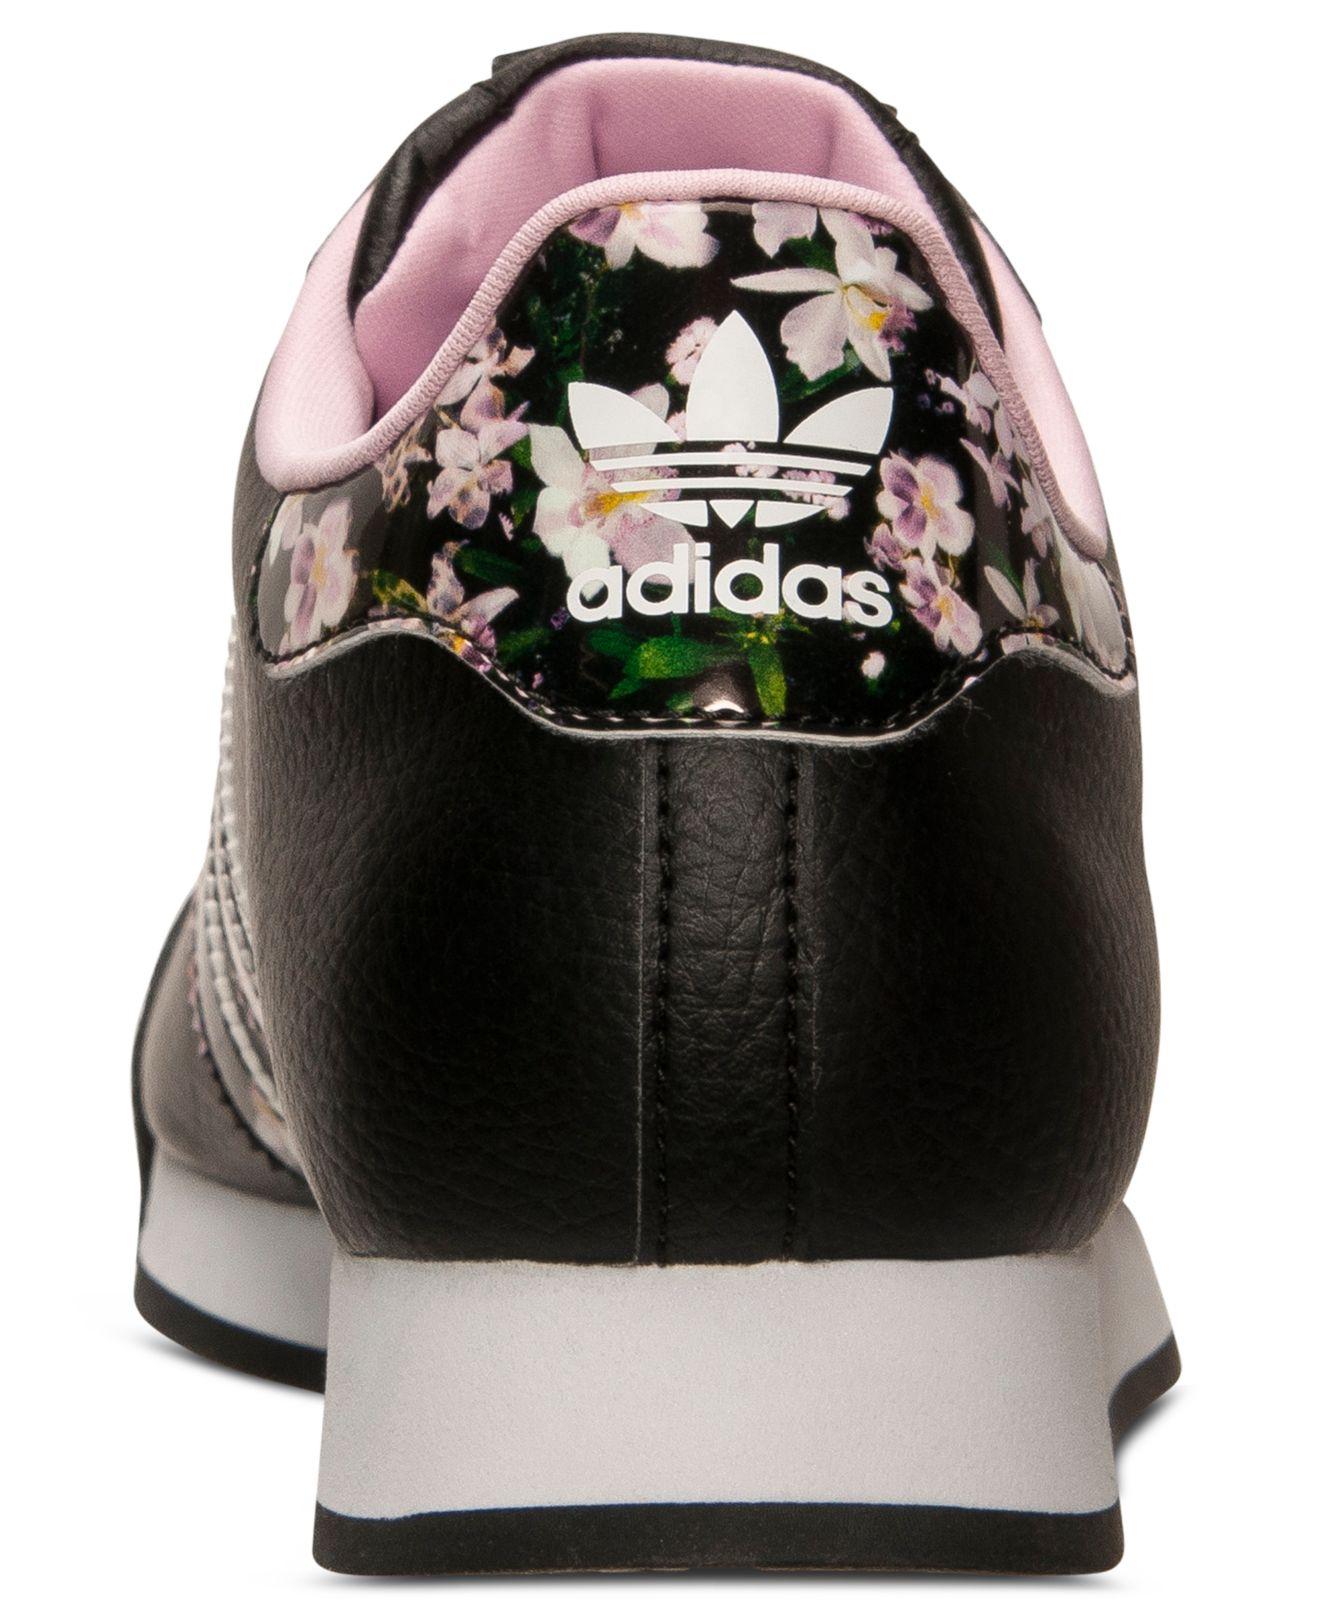 adidas samoa women's floral